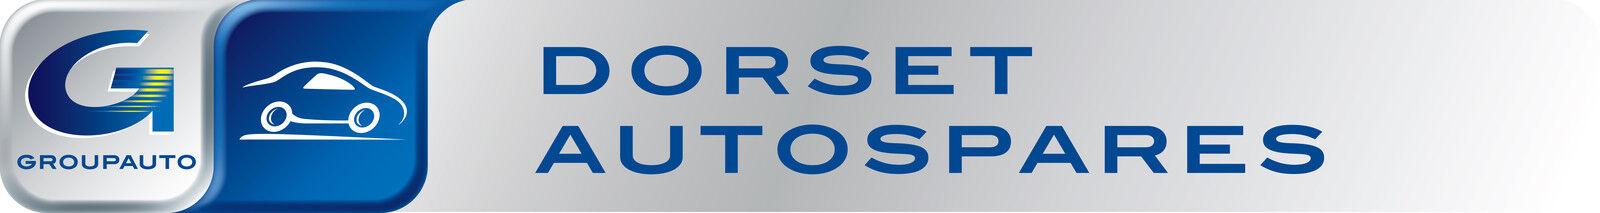 Dorset Autospares Ltd